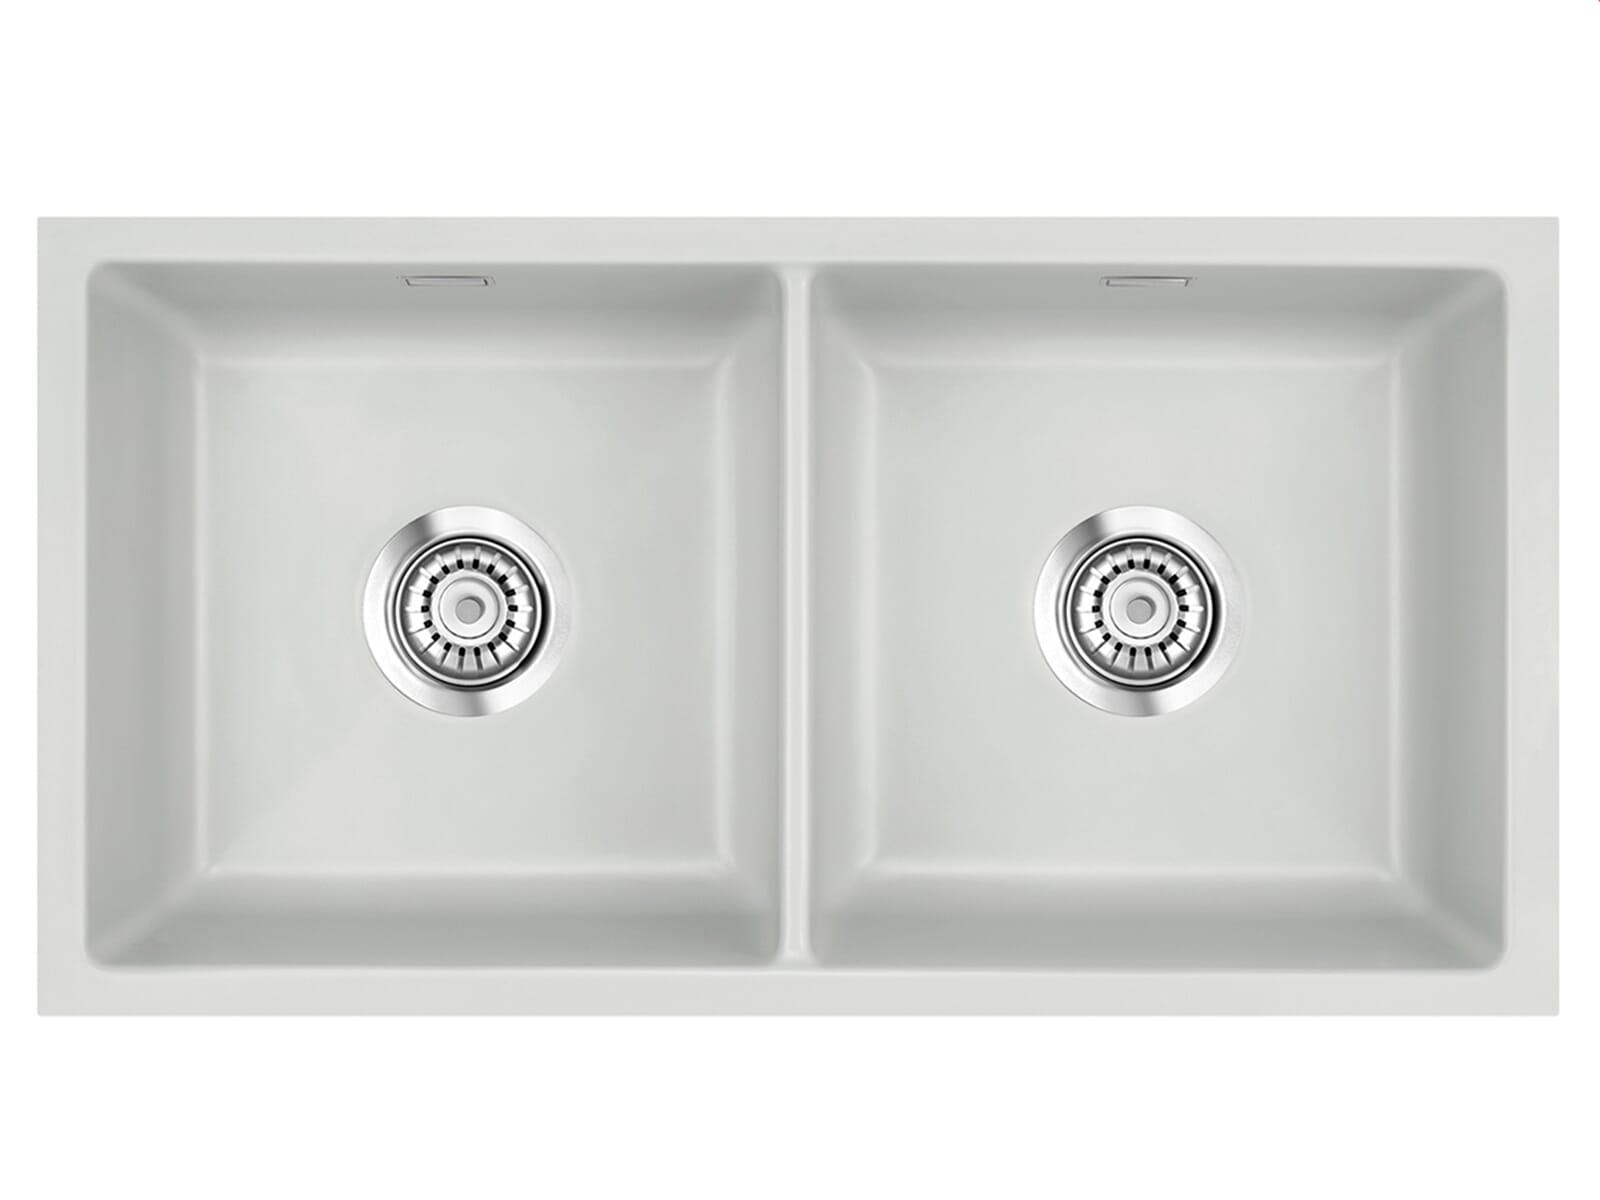 Systemceram Mera Twin U Alu Keramikspüle Handbetätigung